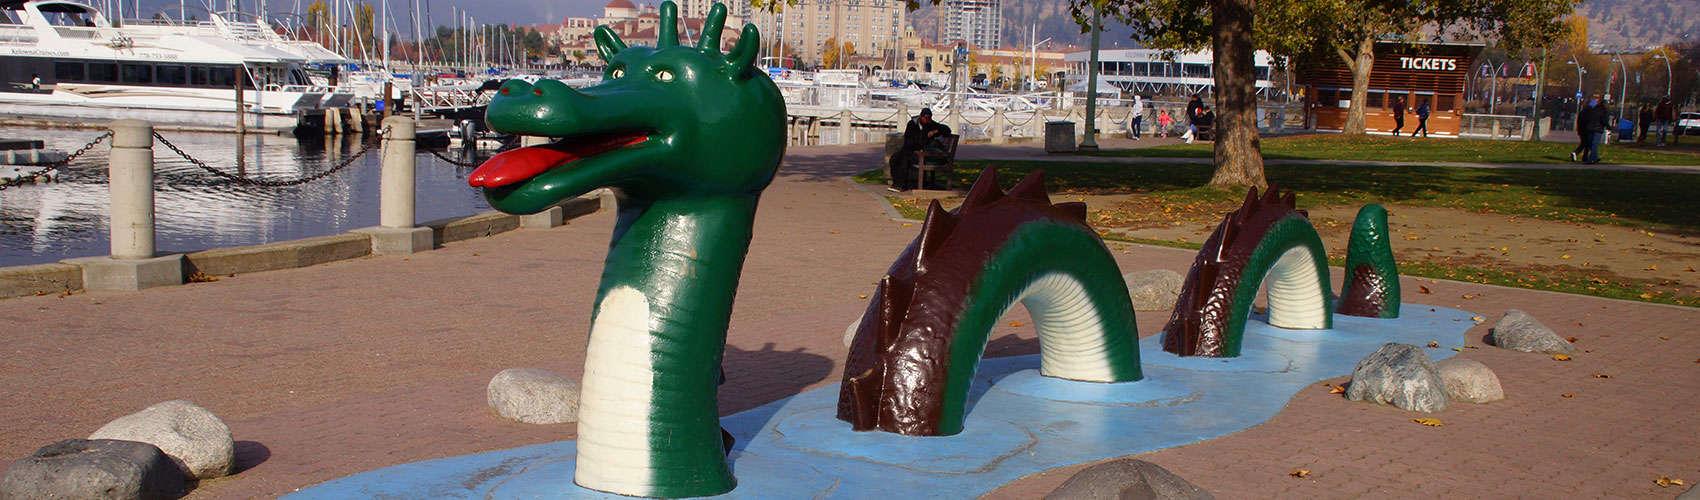 Ogopogo-Statue-Kerry-Park-Kelowna